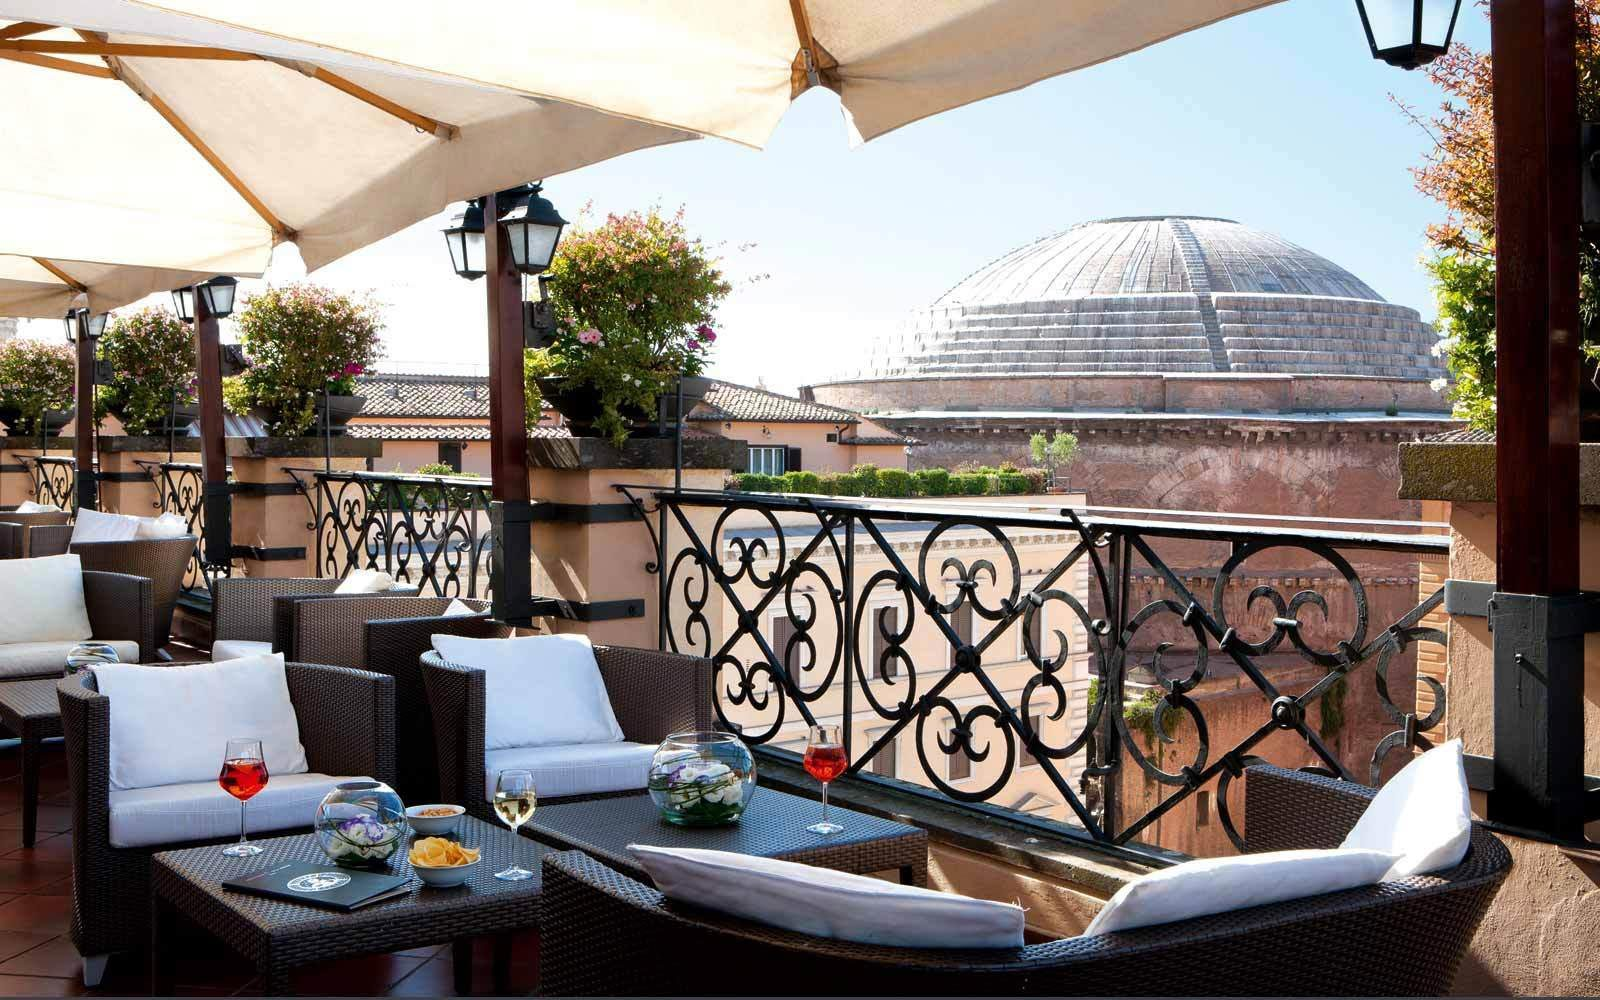 Grant Hotel Minerva Roof Garden Rome